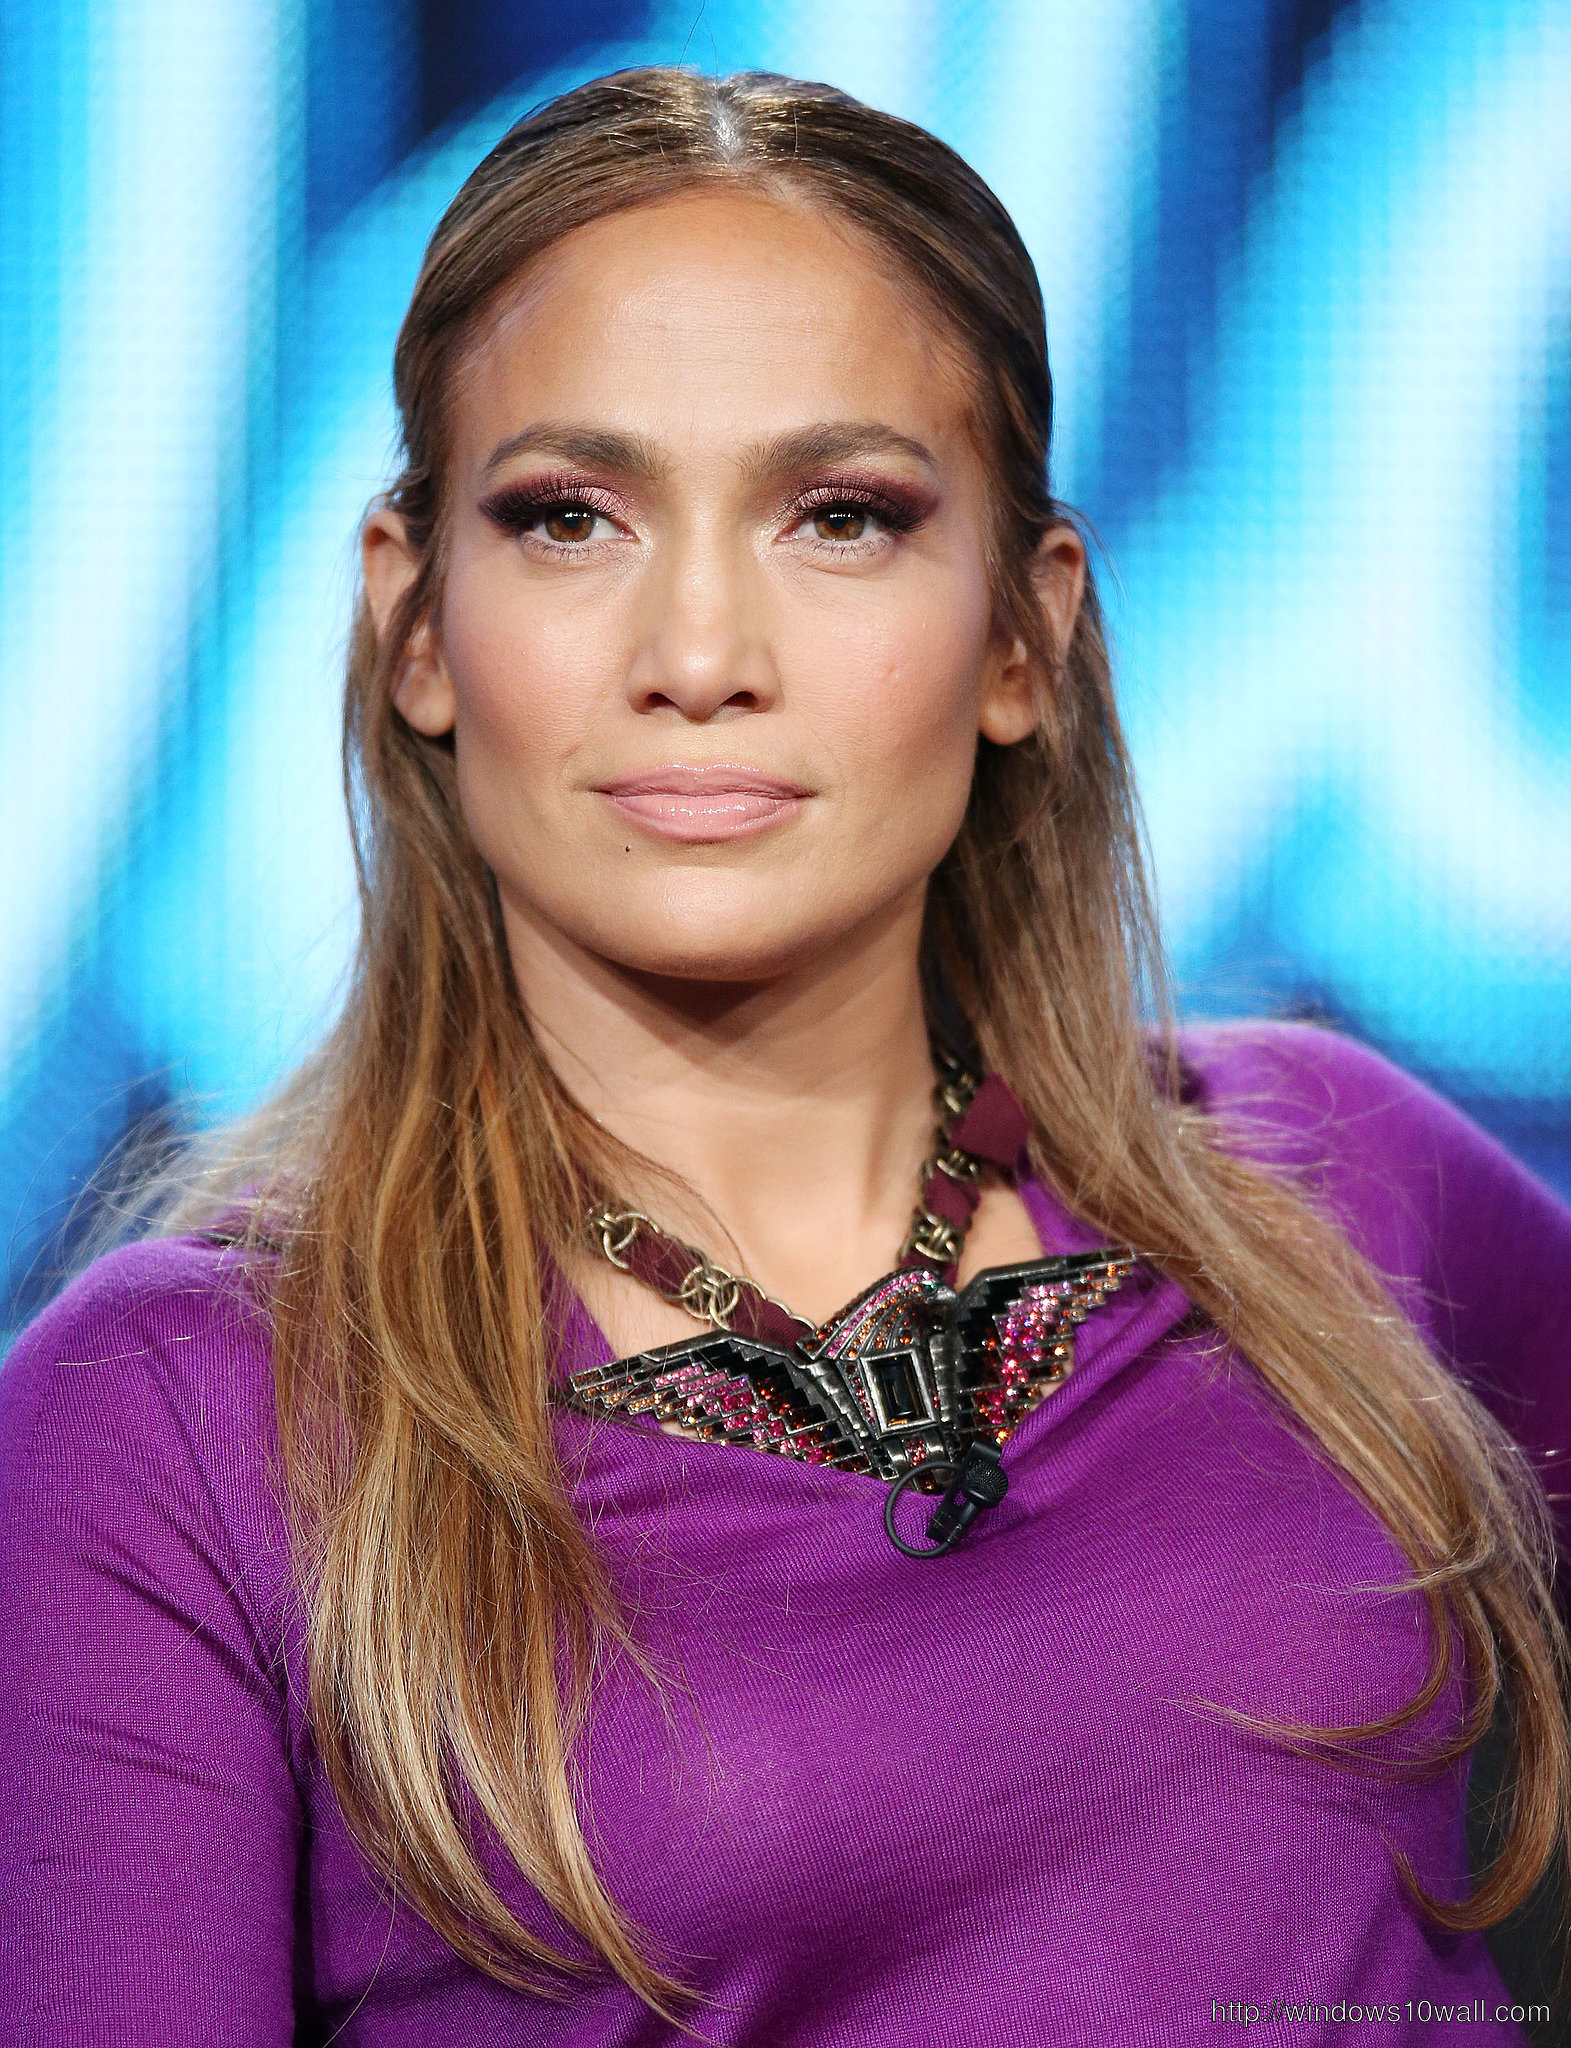 Simple-Jennifer-Lopez-hair-style-in-2014-background-wallpaper